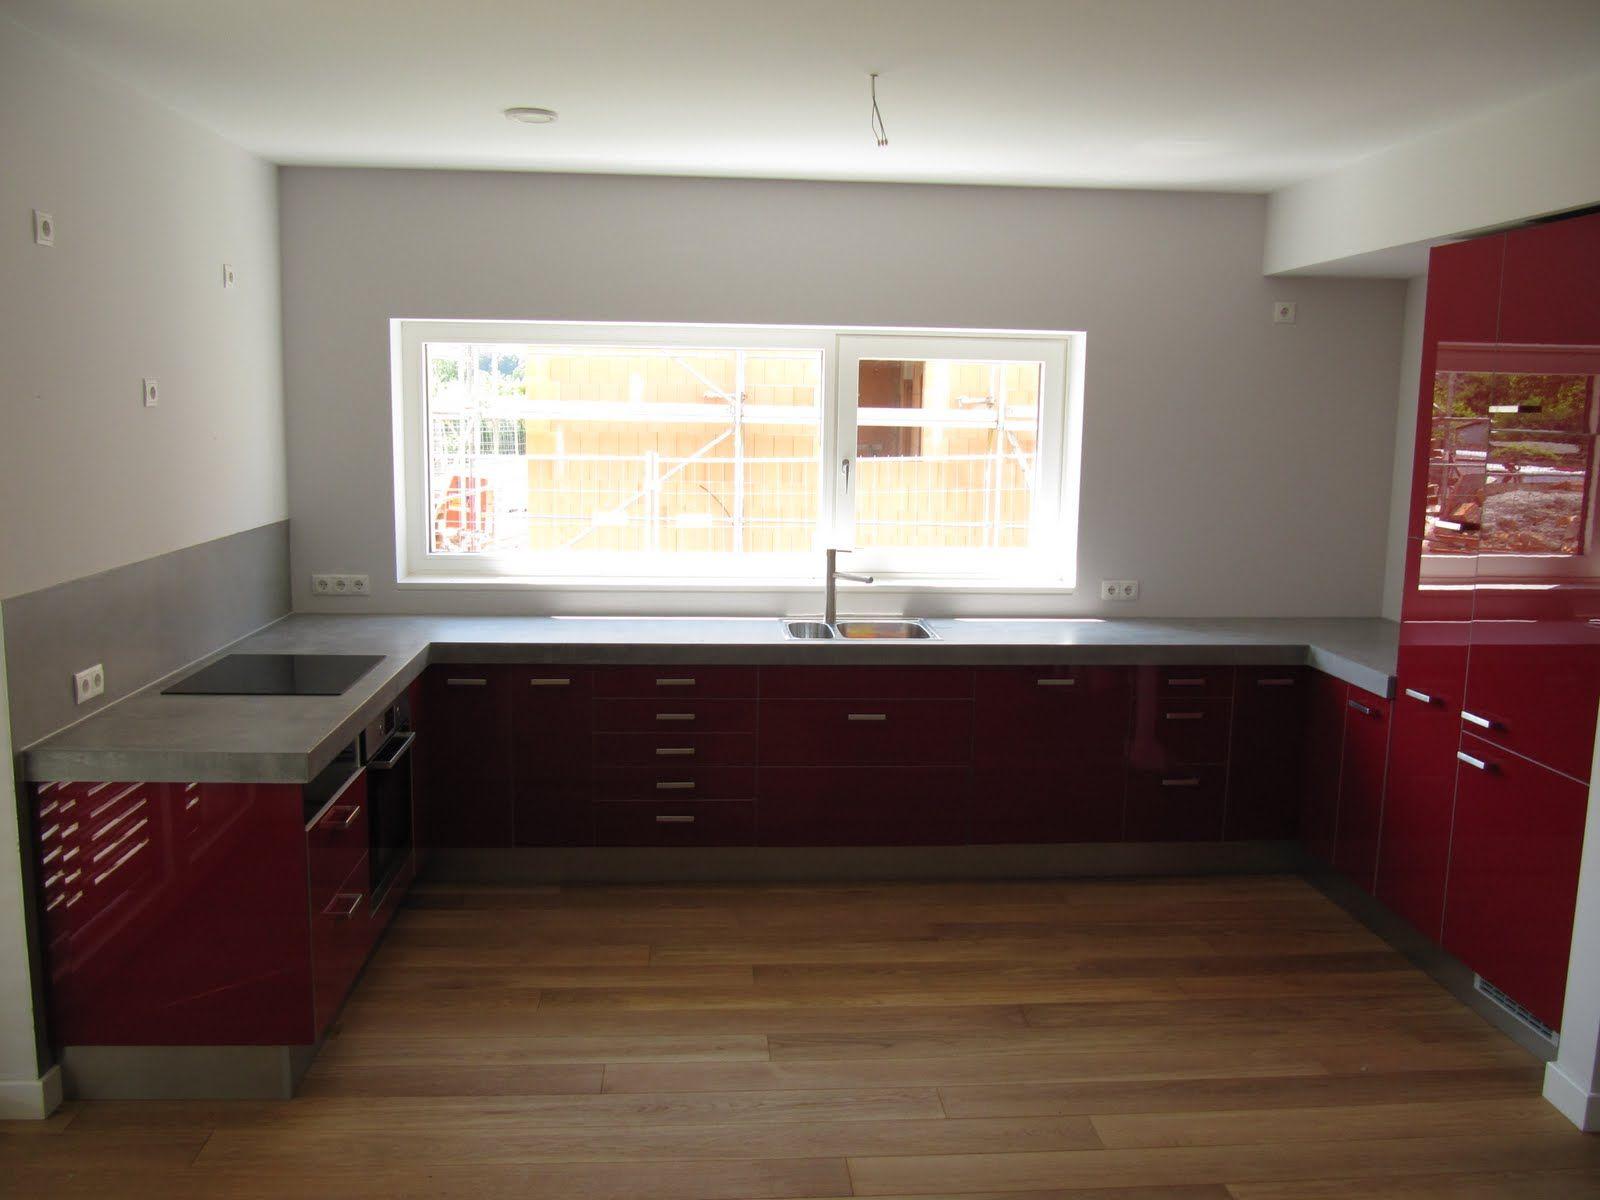 beton cire küche, betonarbeitsplatte | betonarbeitsplatte